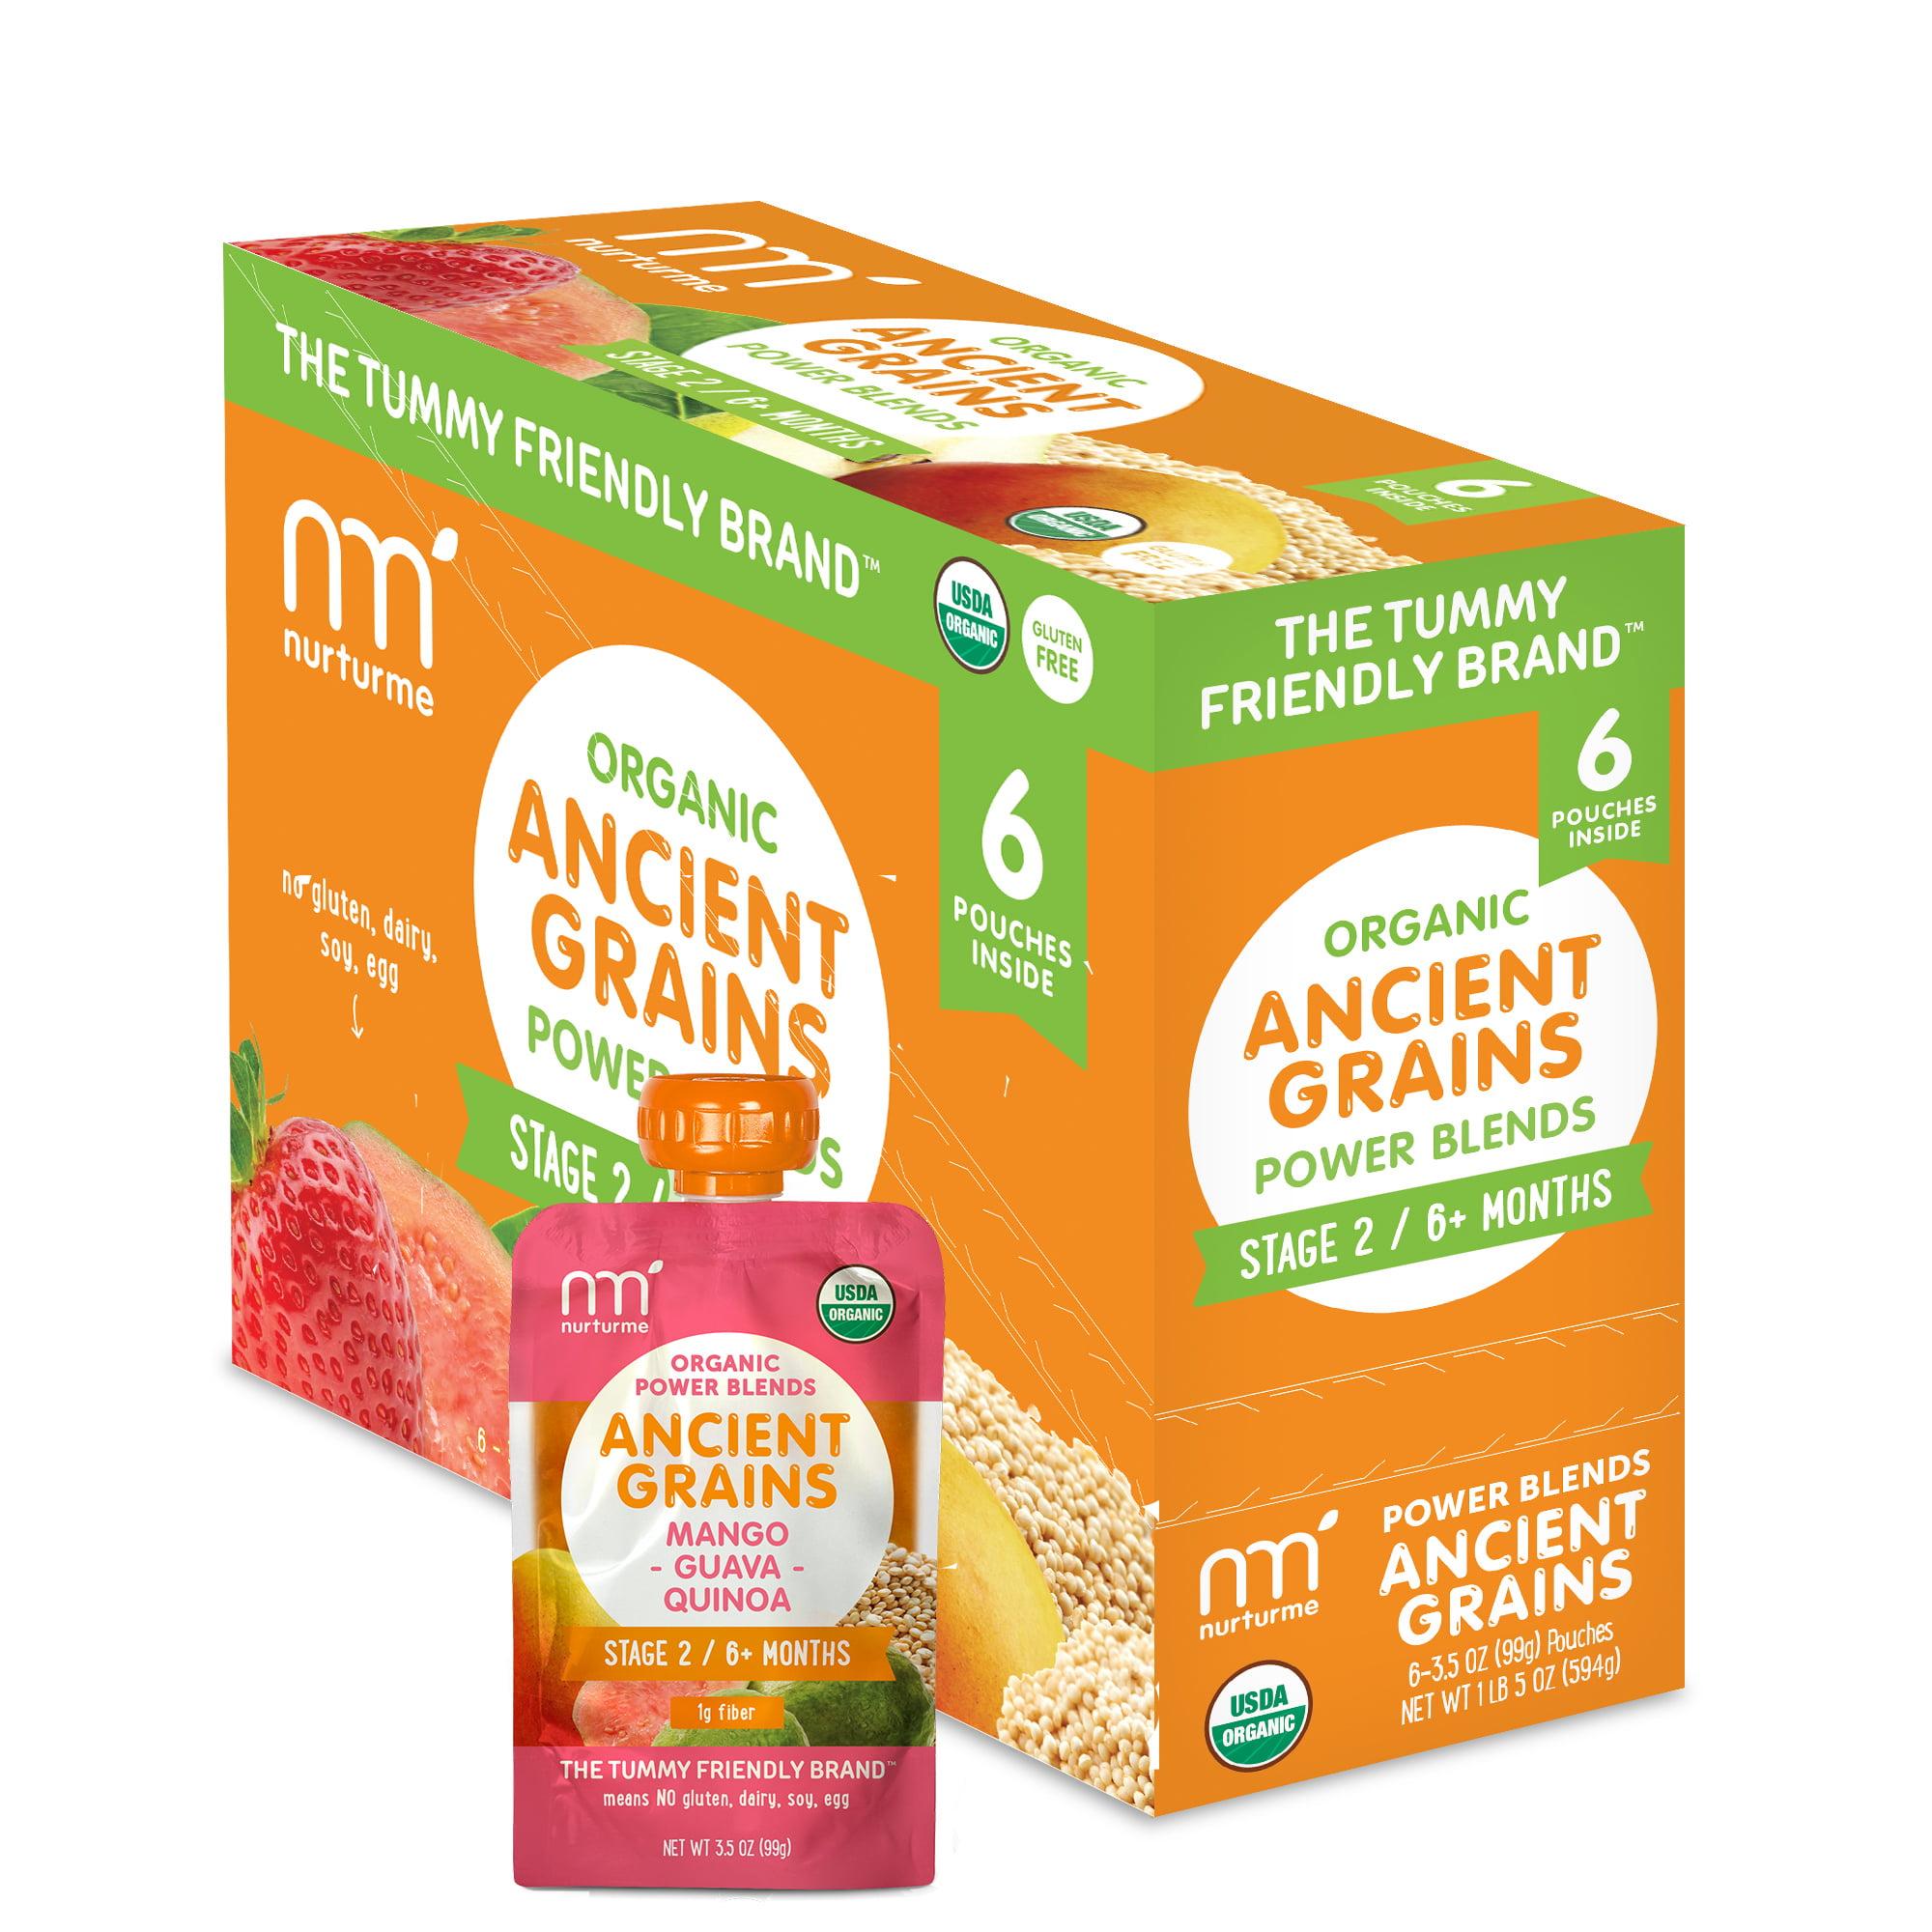 NurturMe Organic Power Blend Ancient Grains Stage 2: Mango + Guava + Quinoa (3.5oz) - 6 Pack